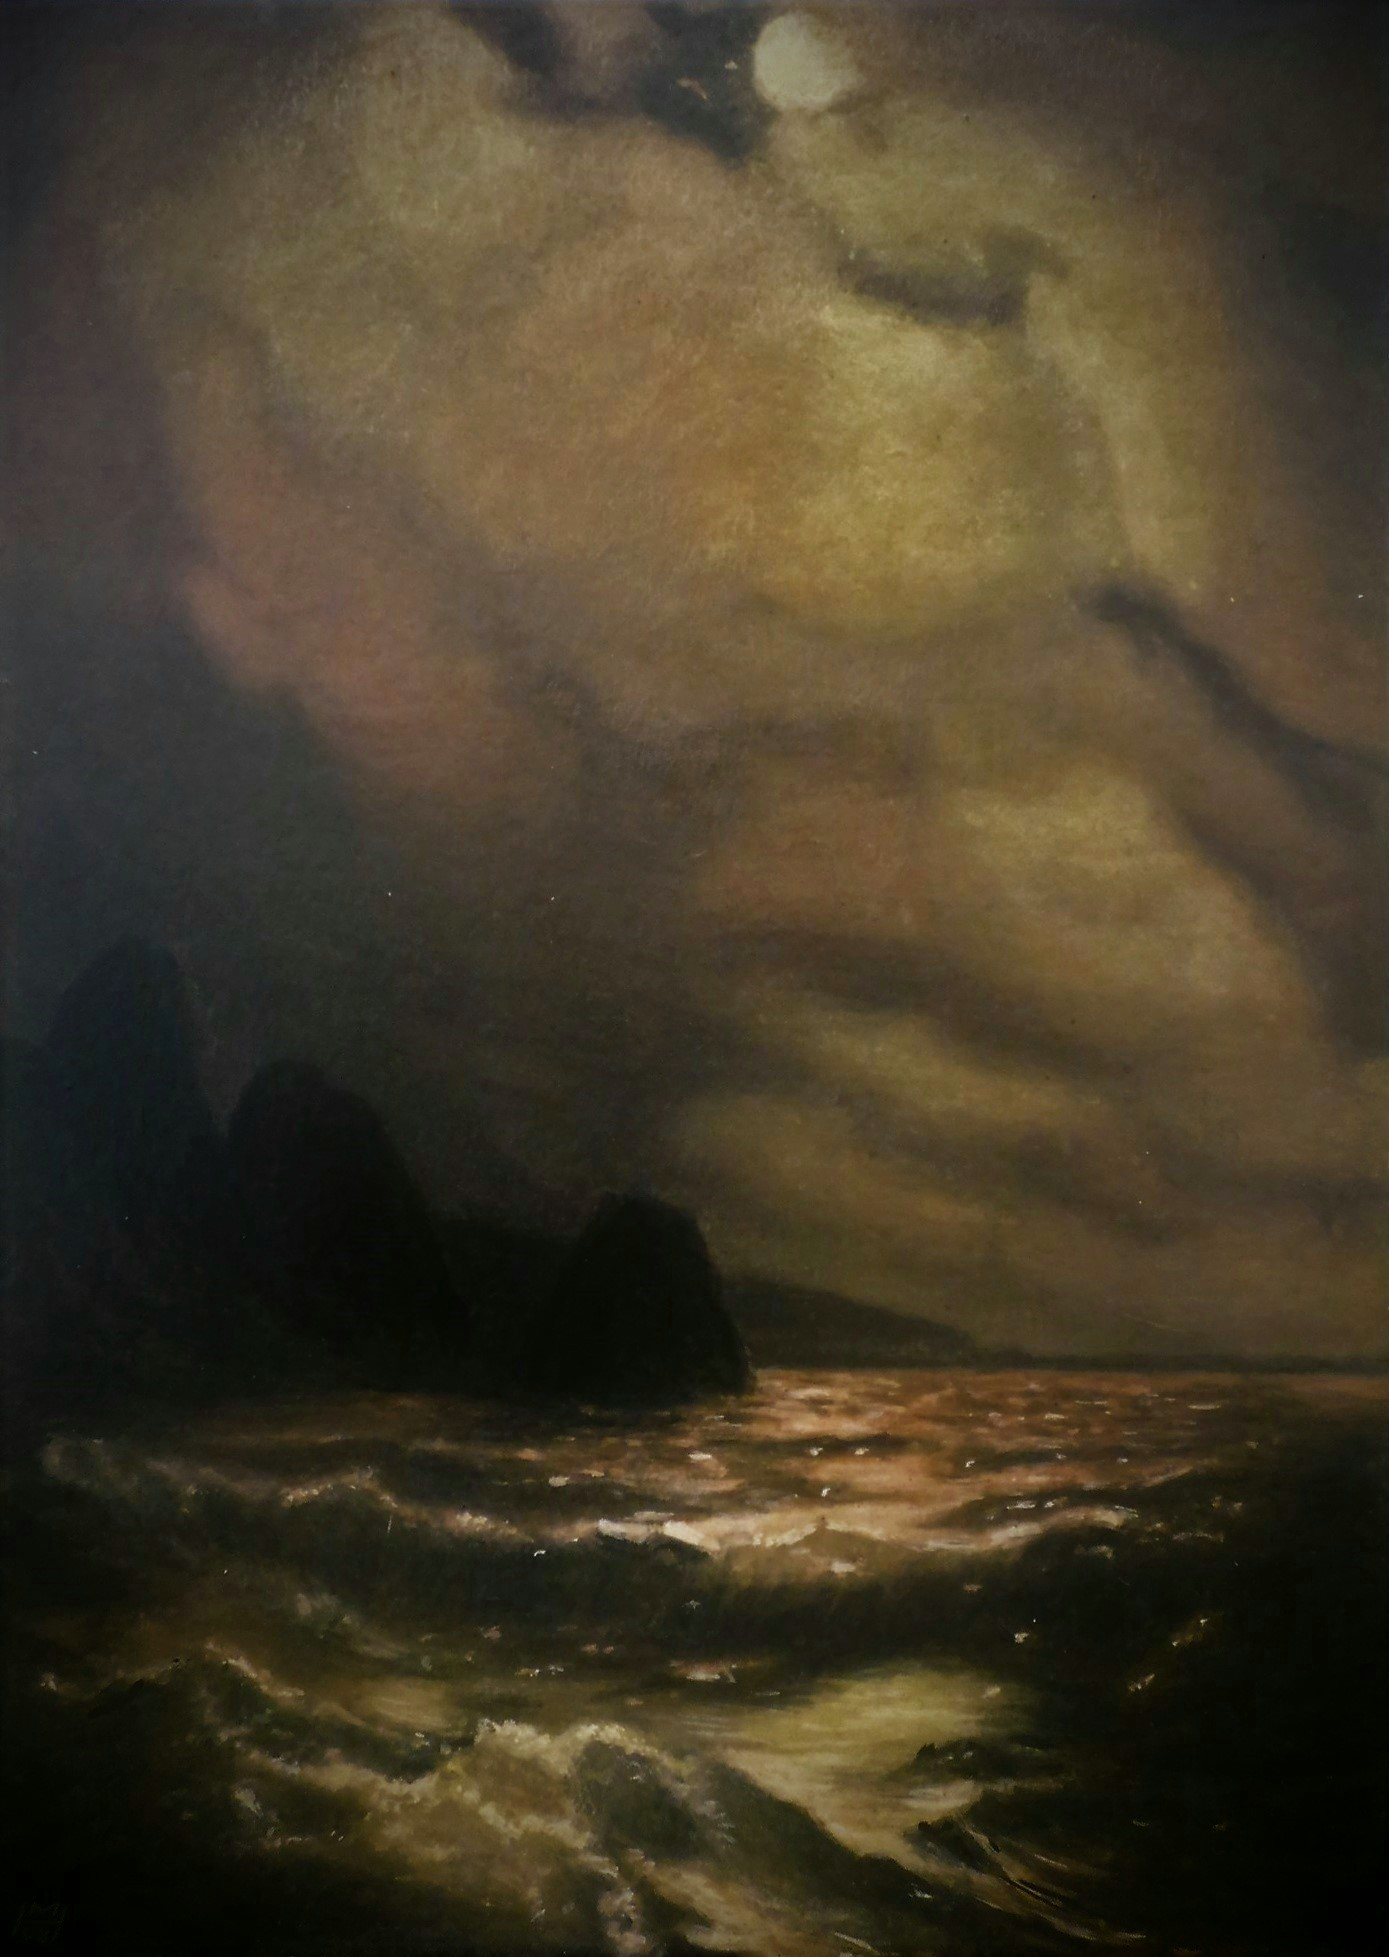 Kopie nach I. Aivazovsky, Akryl auf Holz, 30 x 42 cm